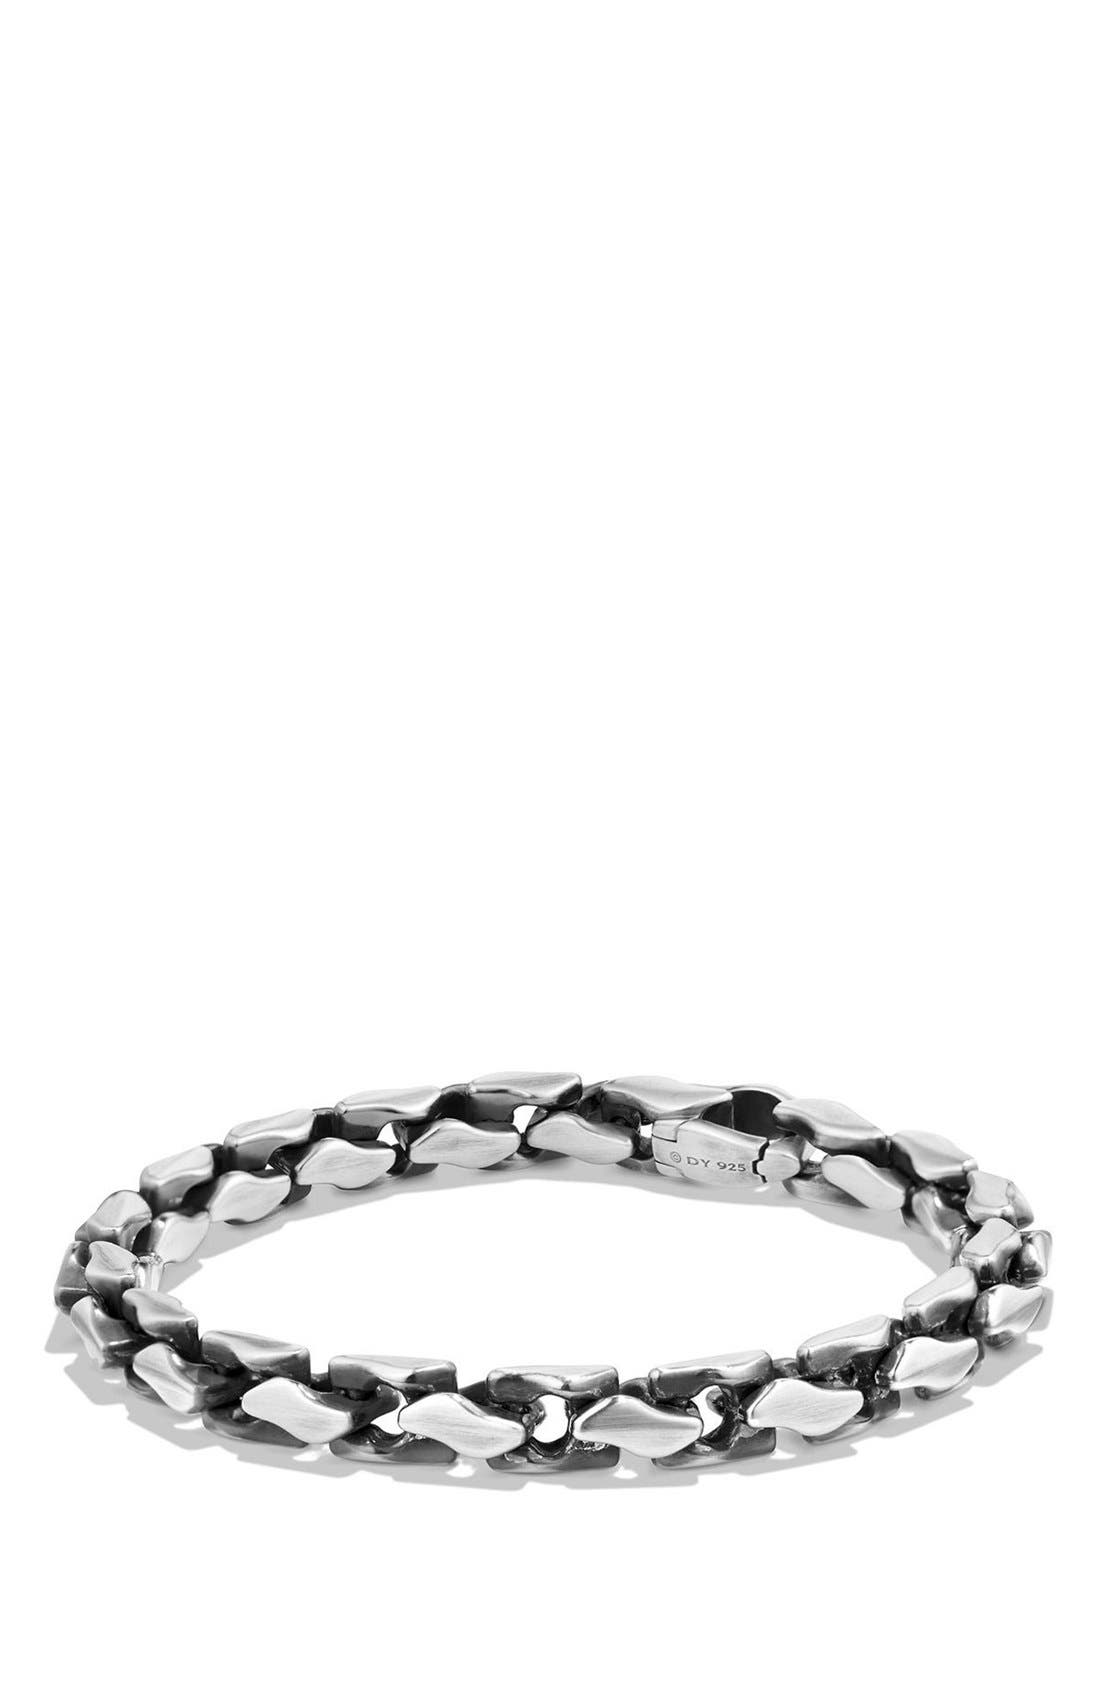 DAVID YURMAN Chain Large Fluted Chain Bracelet